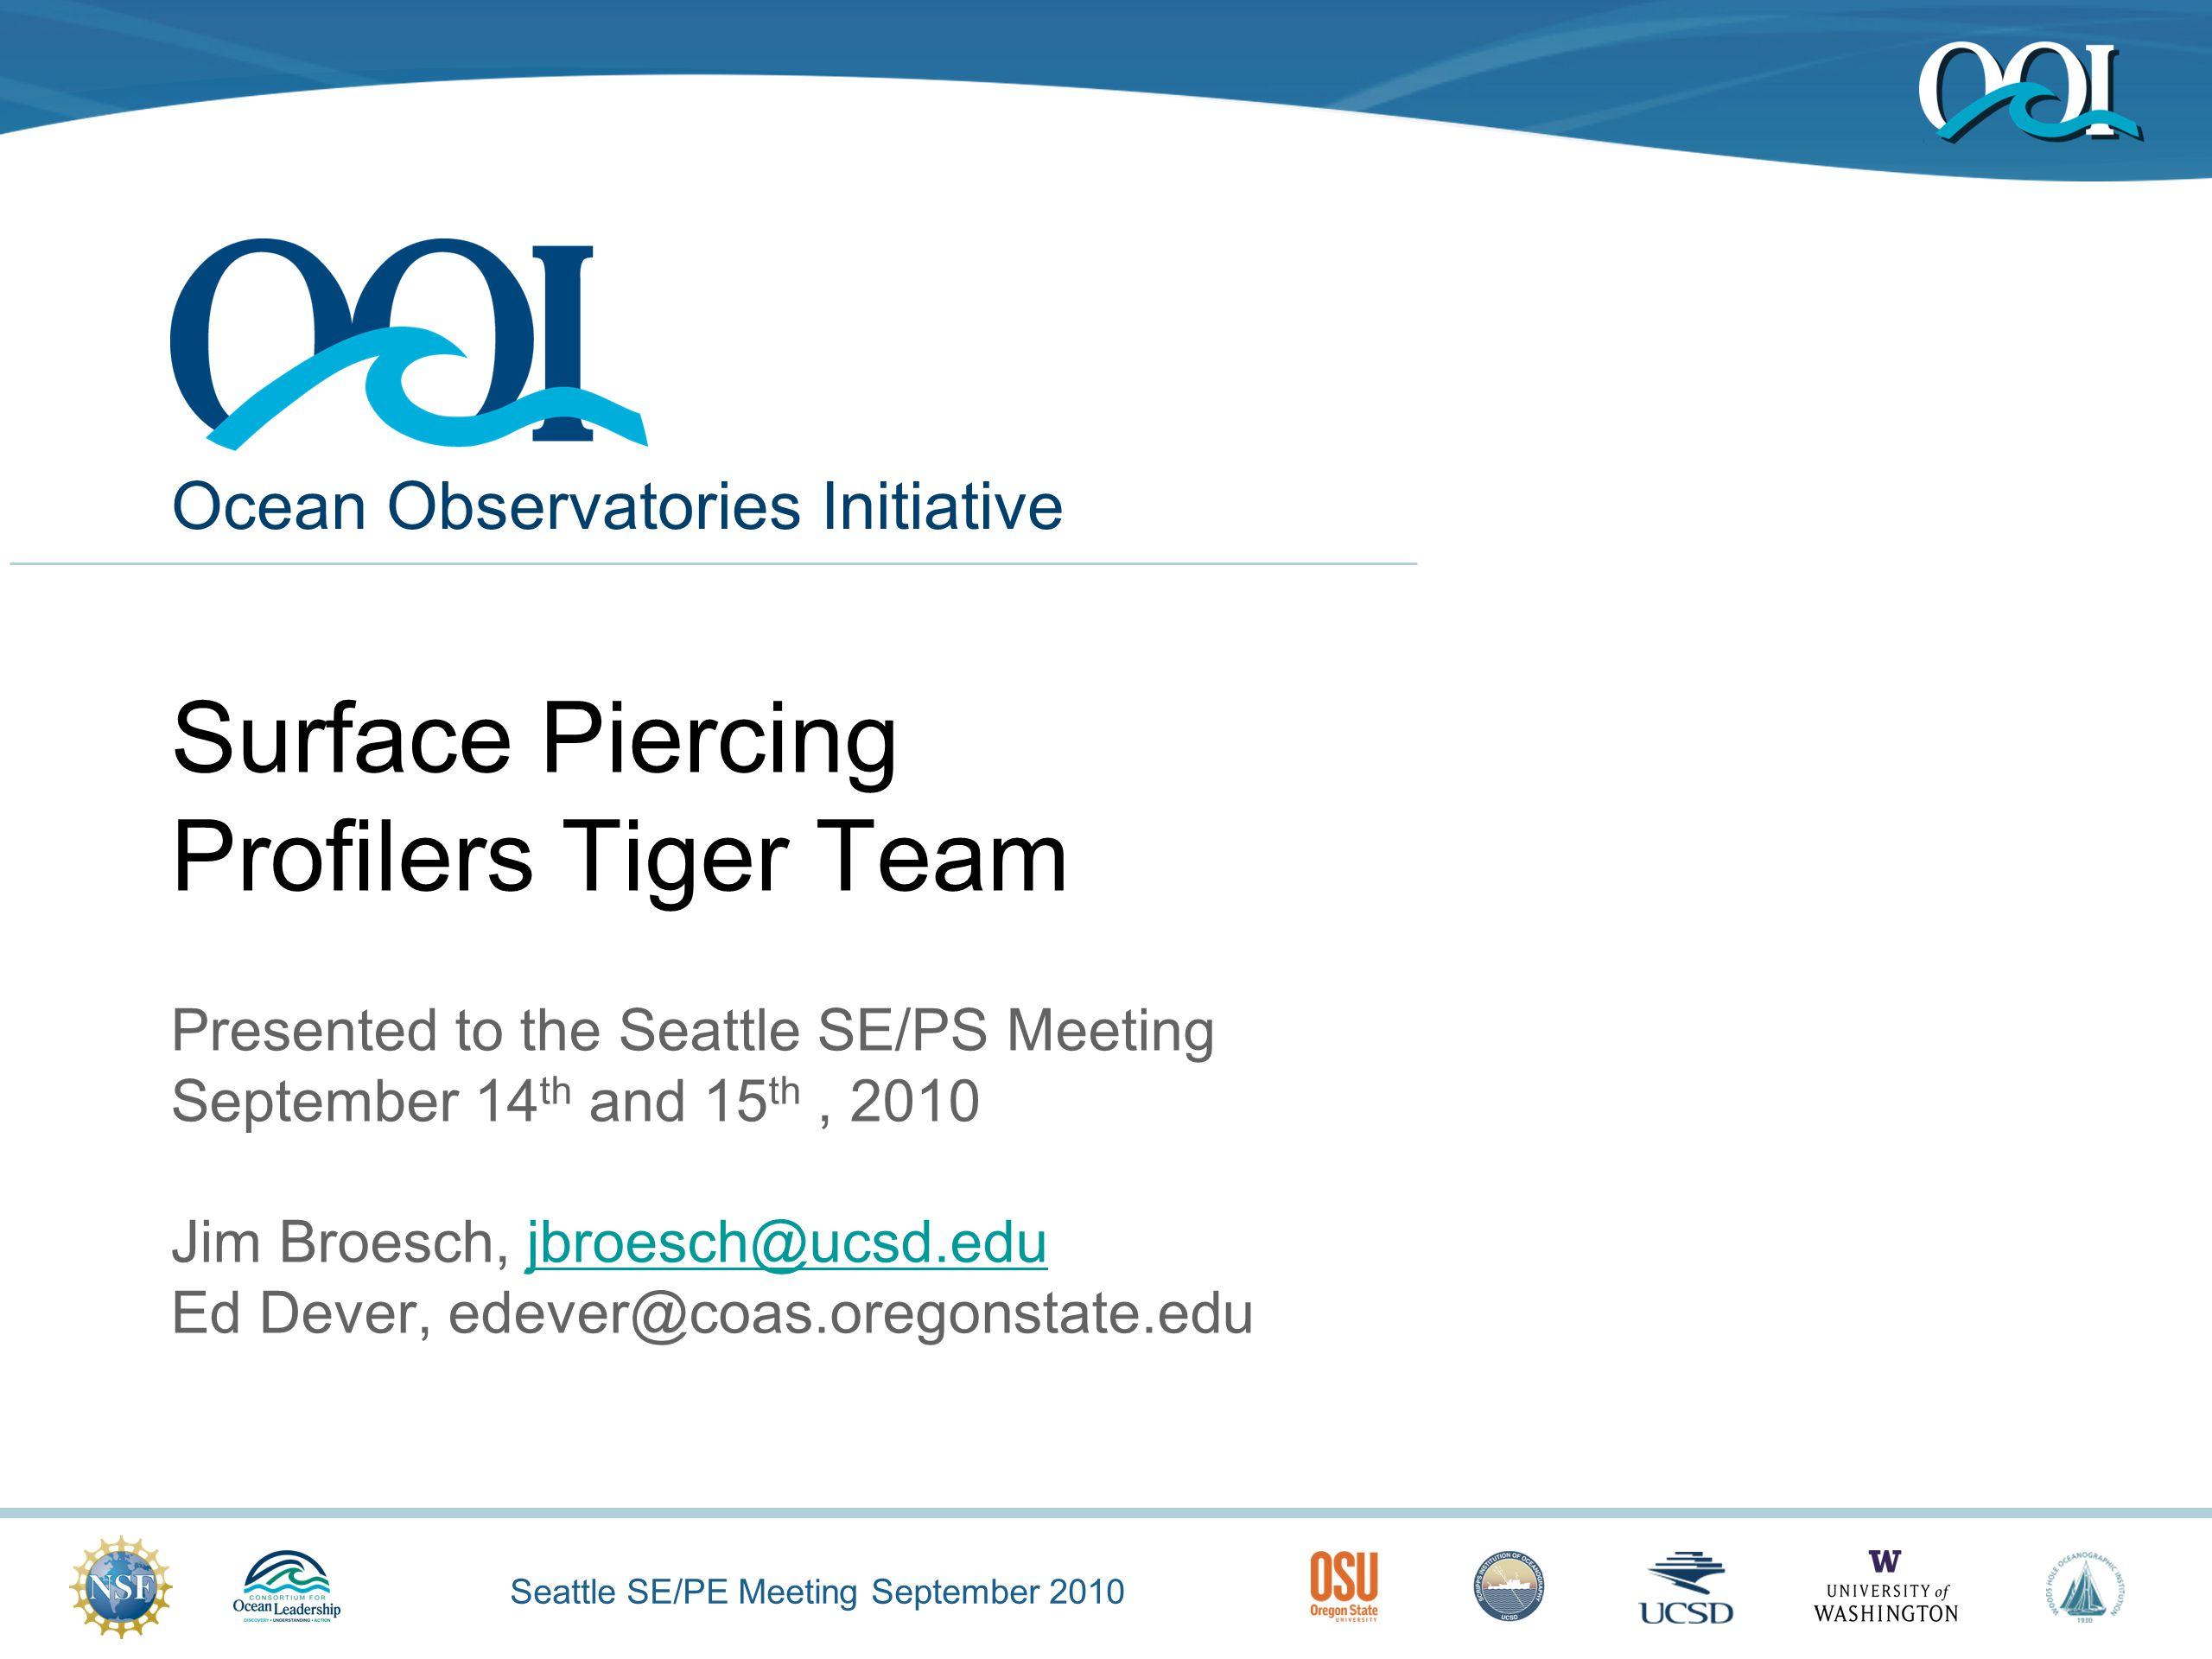 Seattle SE/PE Meeting September 2010 Ocean Observatories Initiative Surface Piercing Profilers Tiger Team Presented to the Seattle SE/PS Meeting September 14 th and 15 th, 2010 Jim Broesch, jbroesch@ucsd.edujbroesch@ucsd.edu Ed Dever, edever@coas.oregonstate.edu